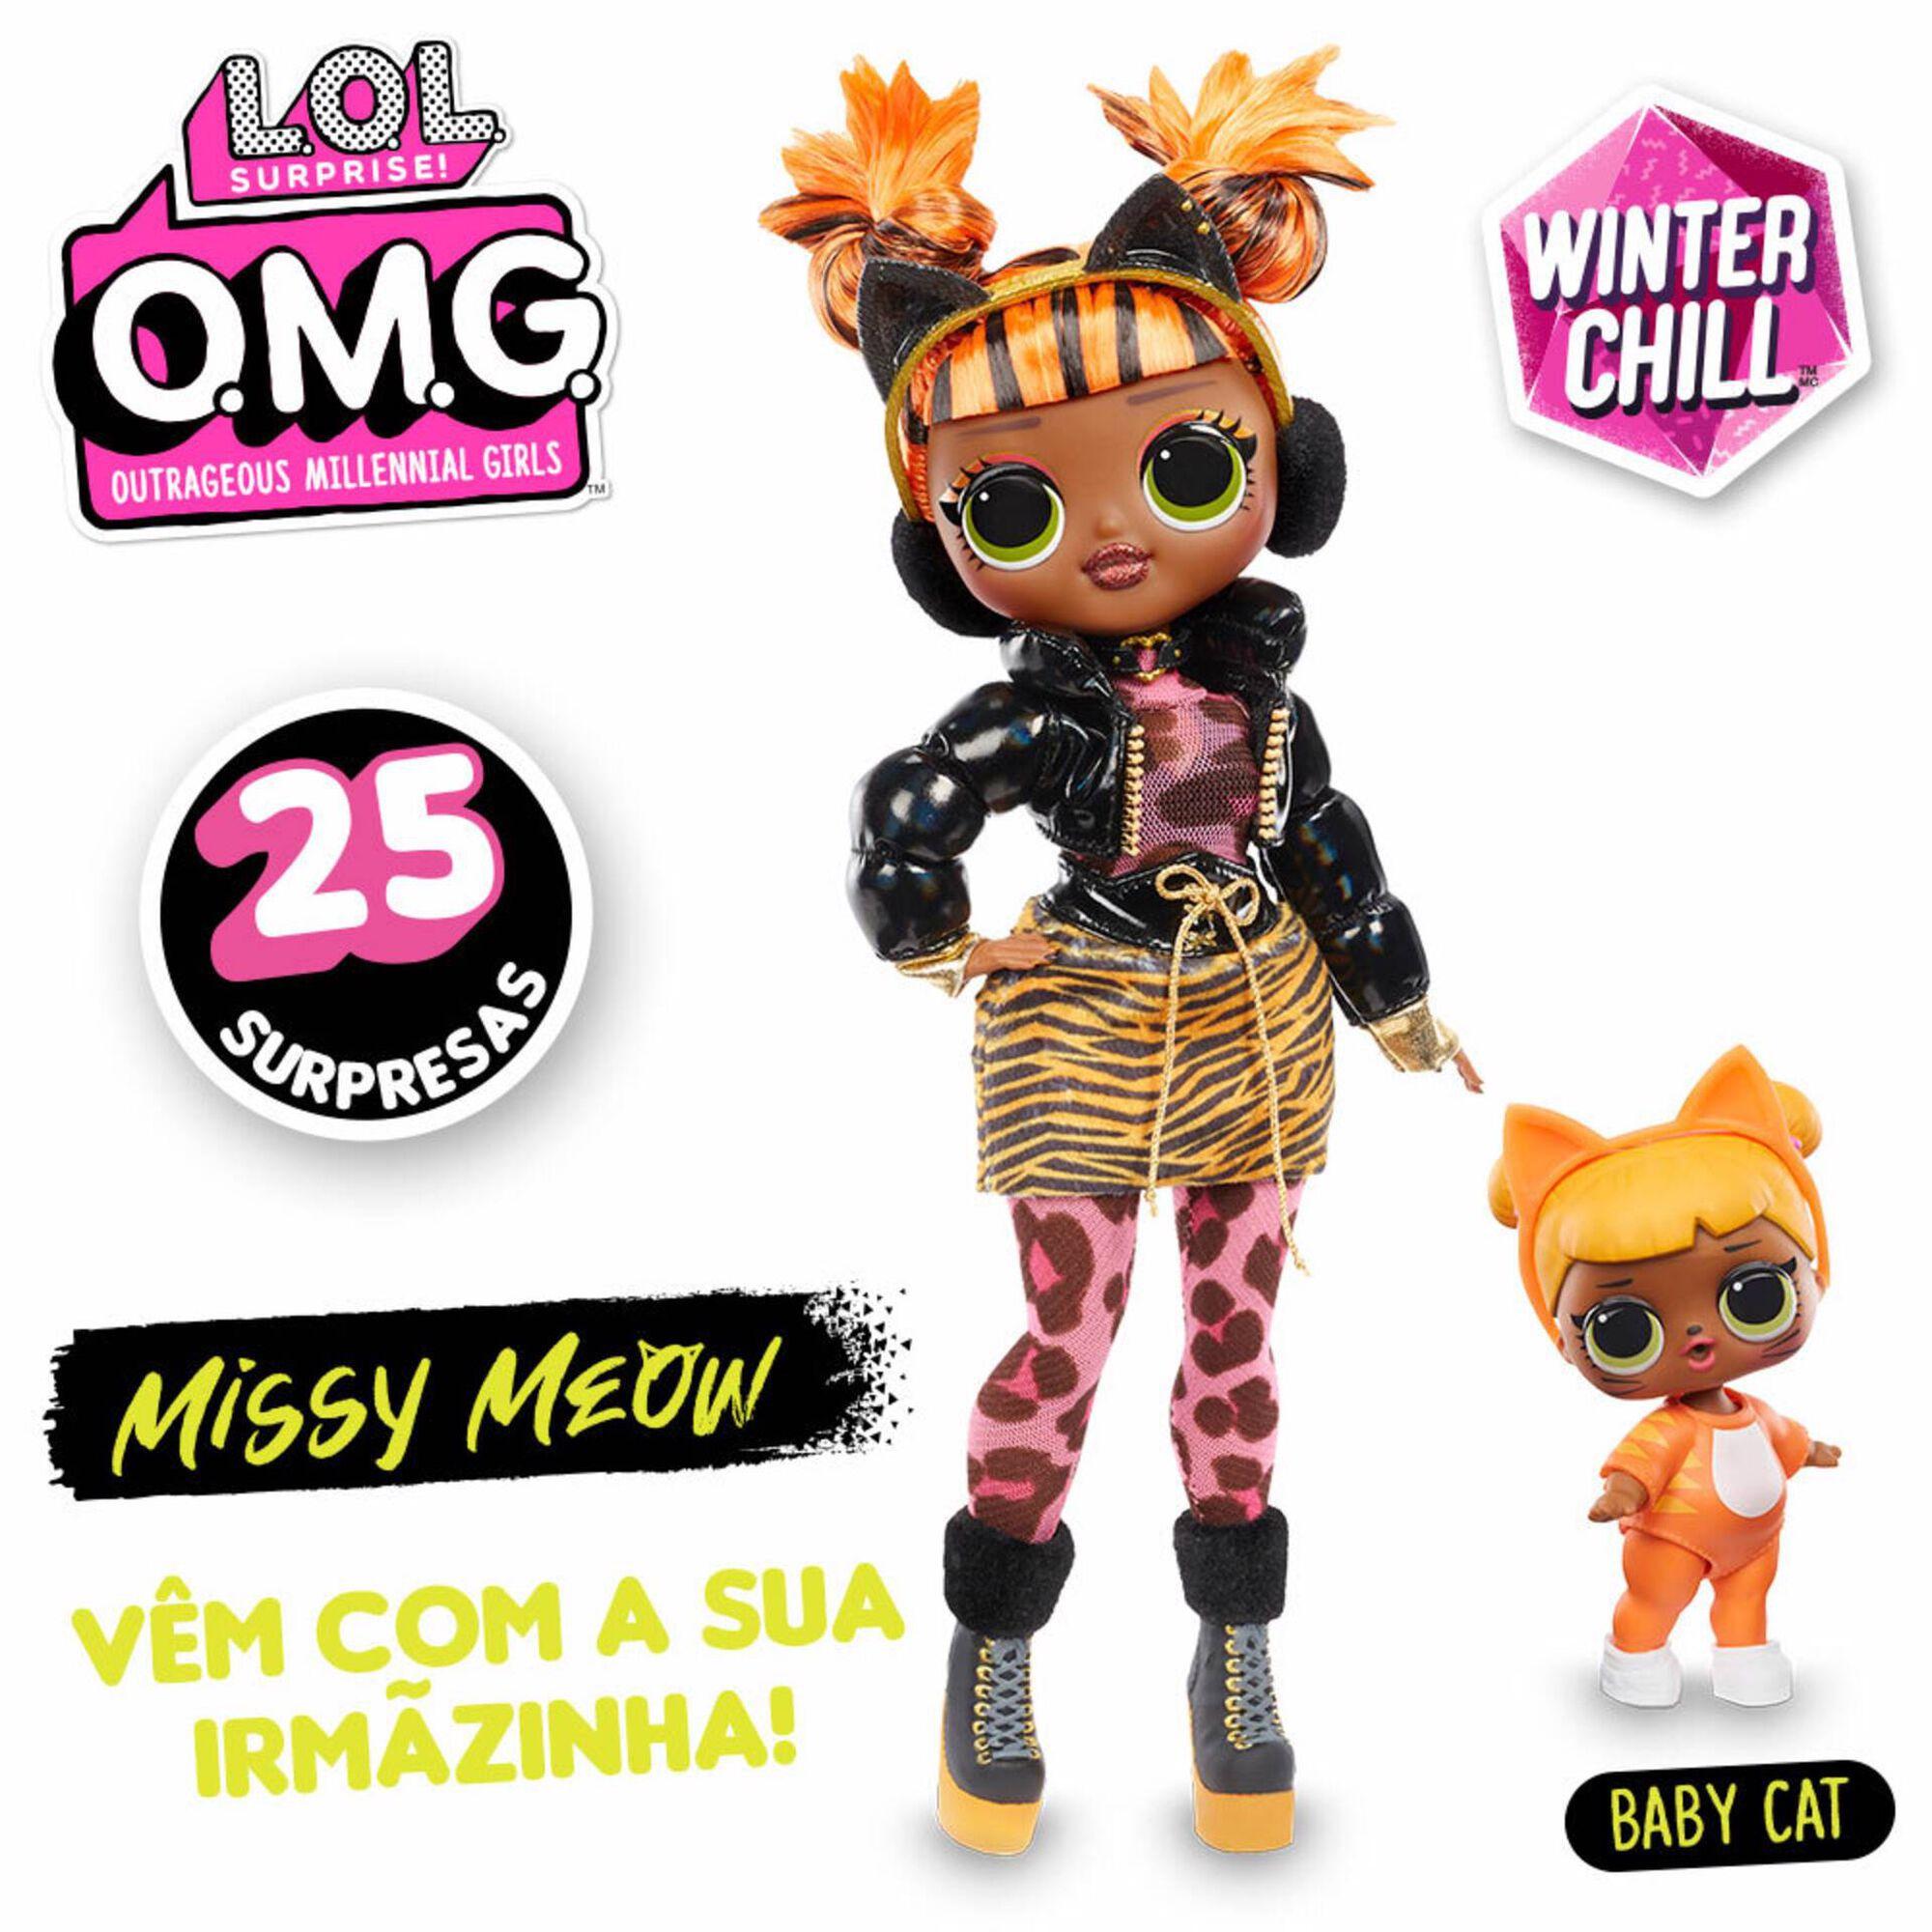 Boneca L.O.L. Surprise! Missy Meow